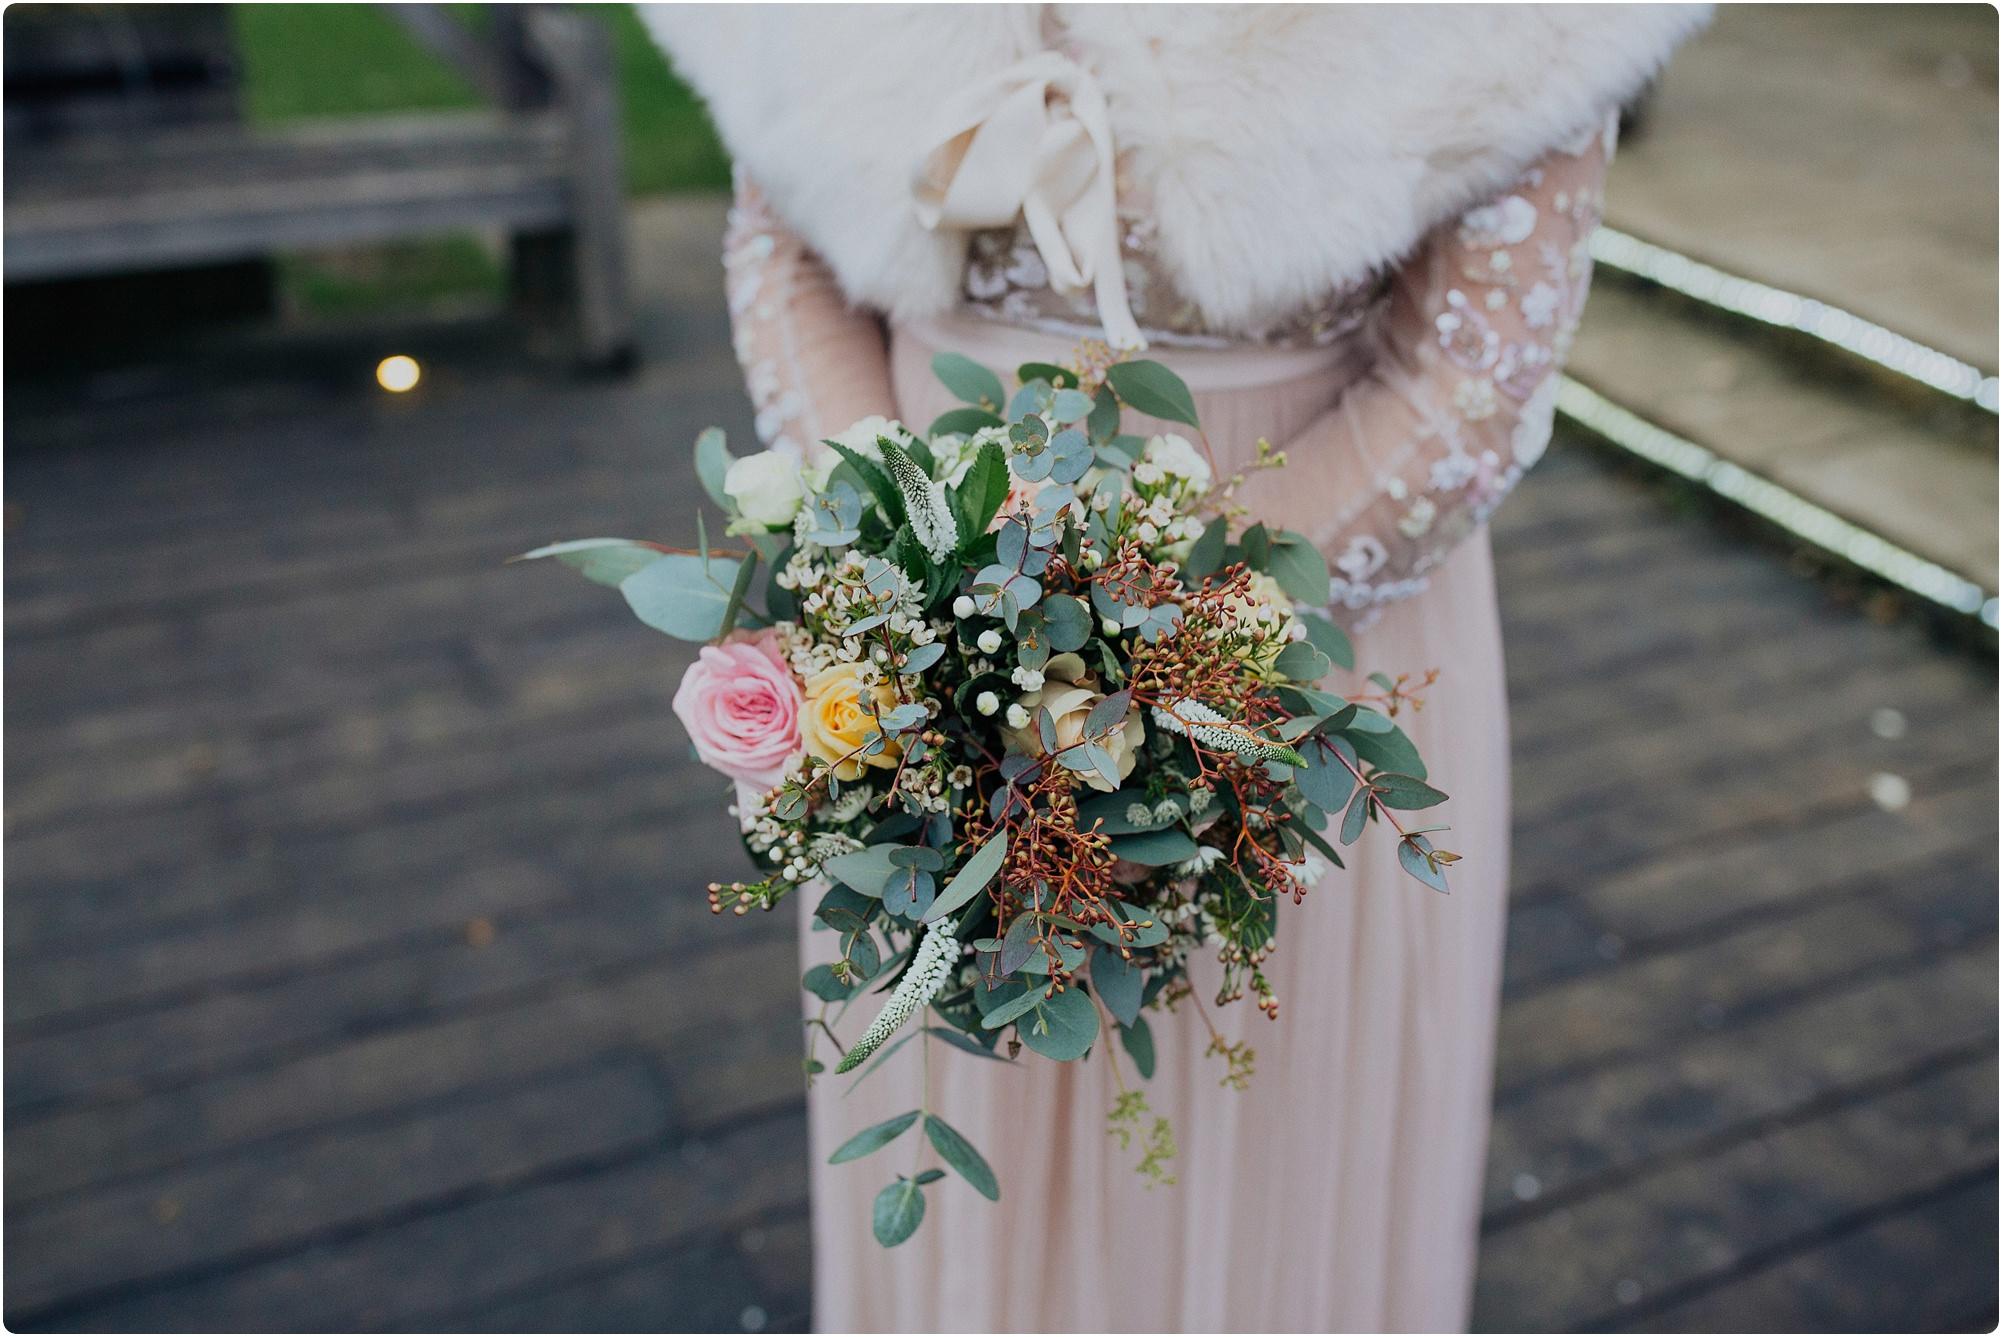 winter bouquet by go wild flowers at a Cripps Barn Winter Wedding